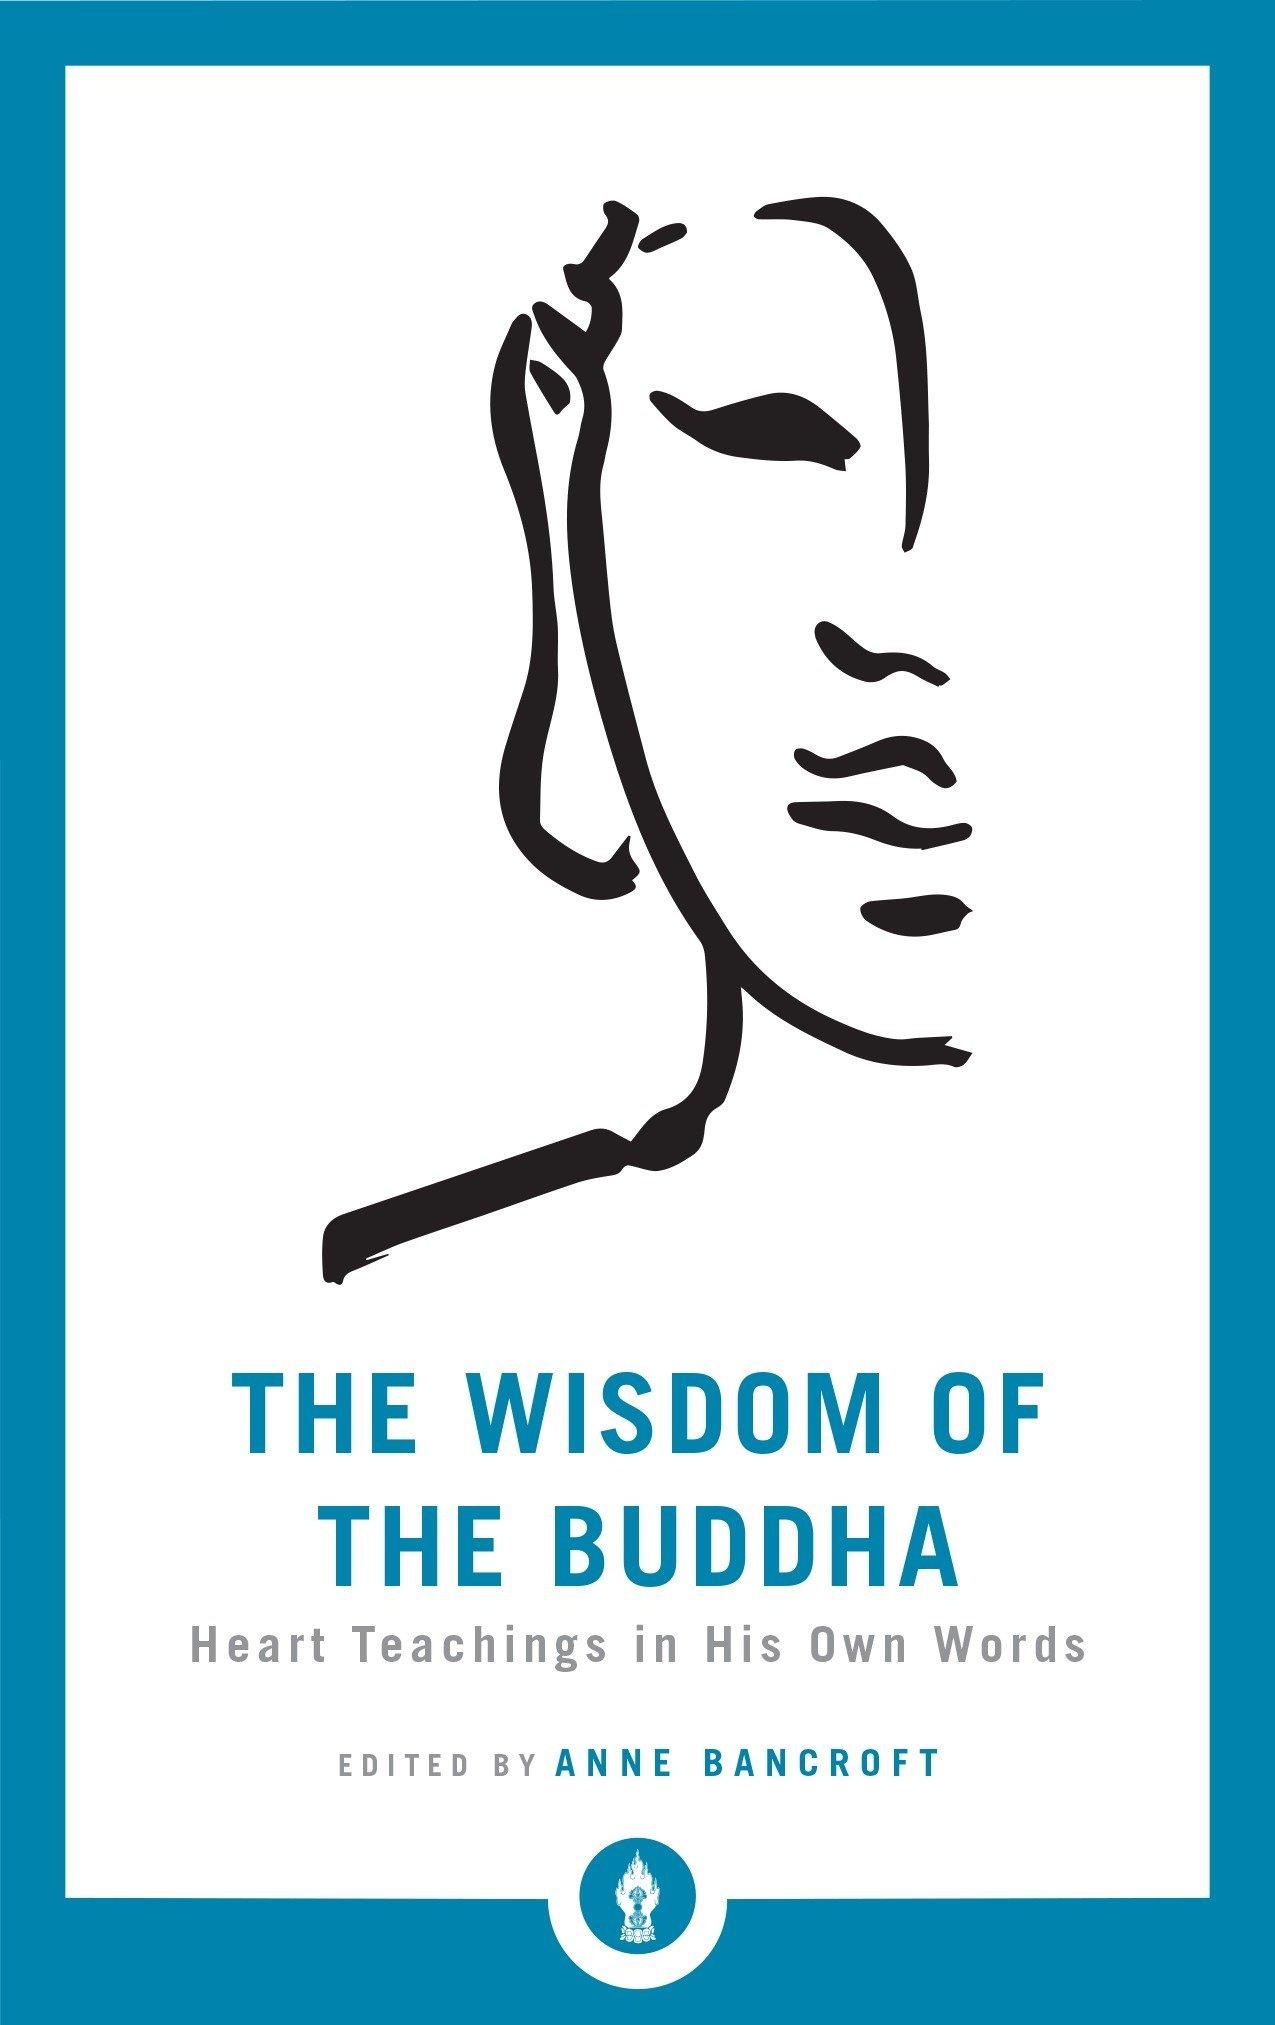 Bancroft Wisdom of Buddha cover art